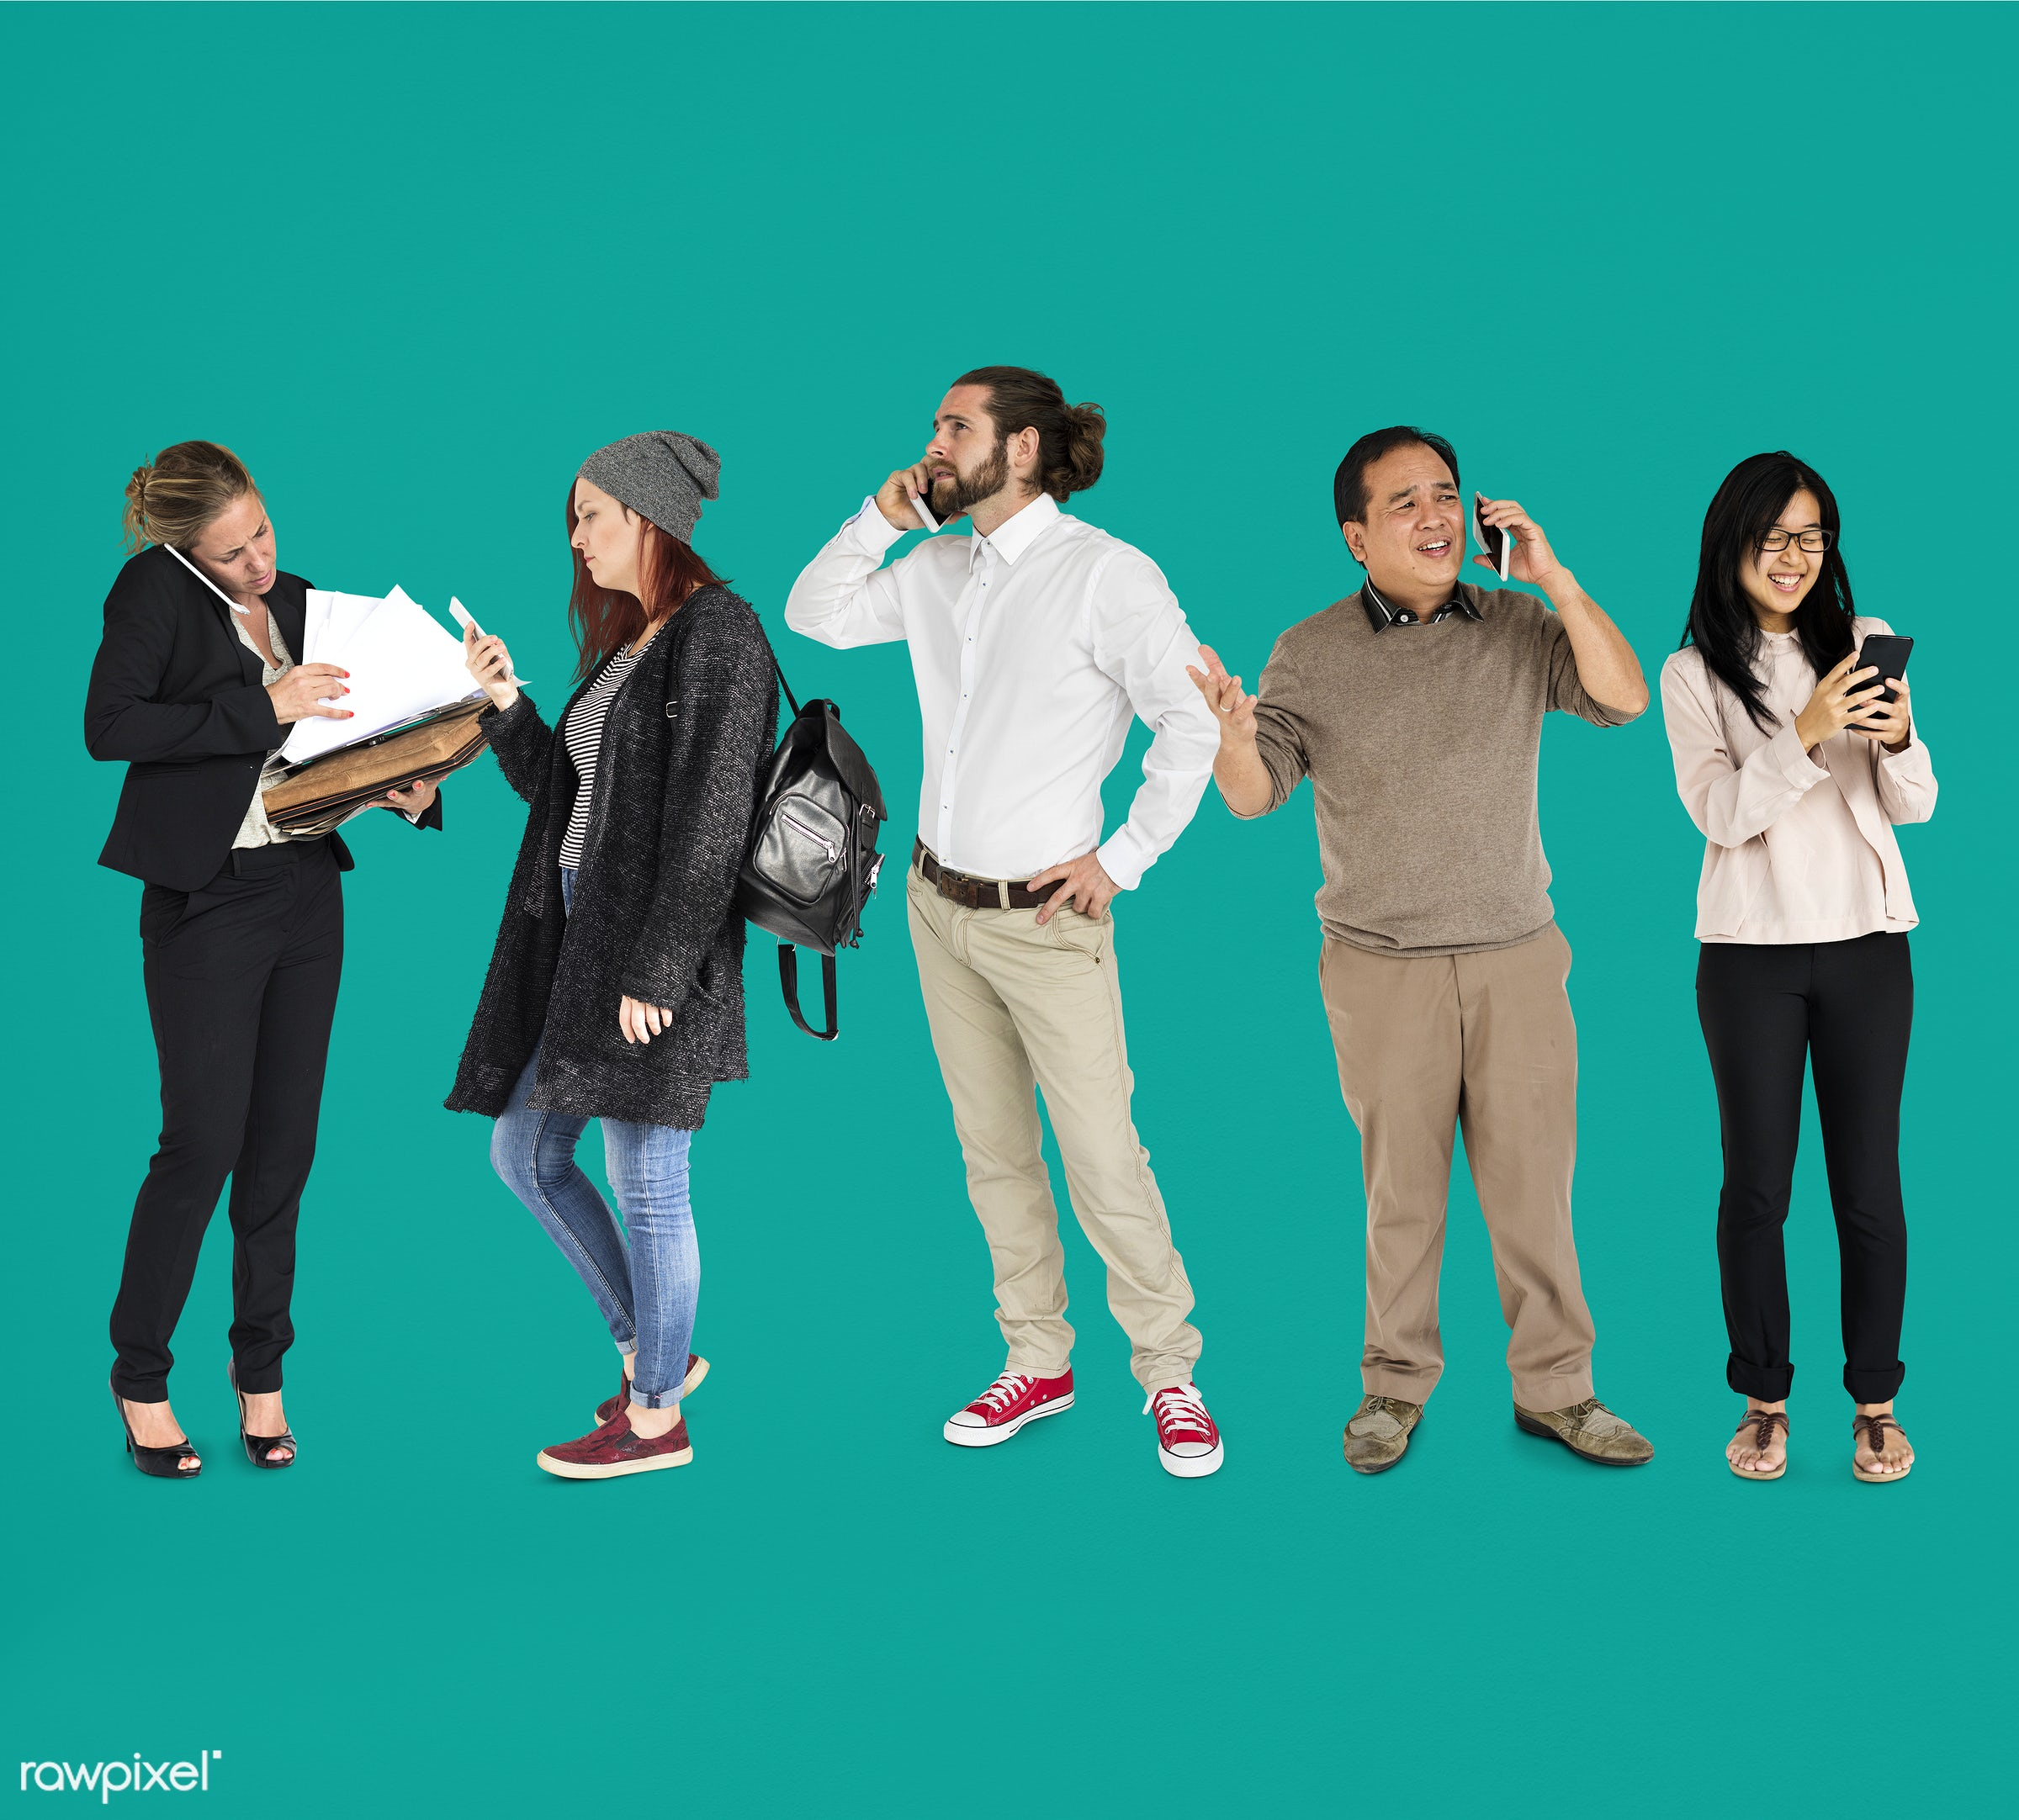 using, full length, diverse, people, race, asian, caucasian, social, woman, lifestyle, studio squareset, smart phone,...